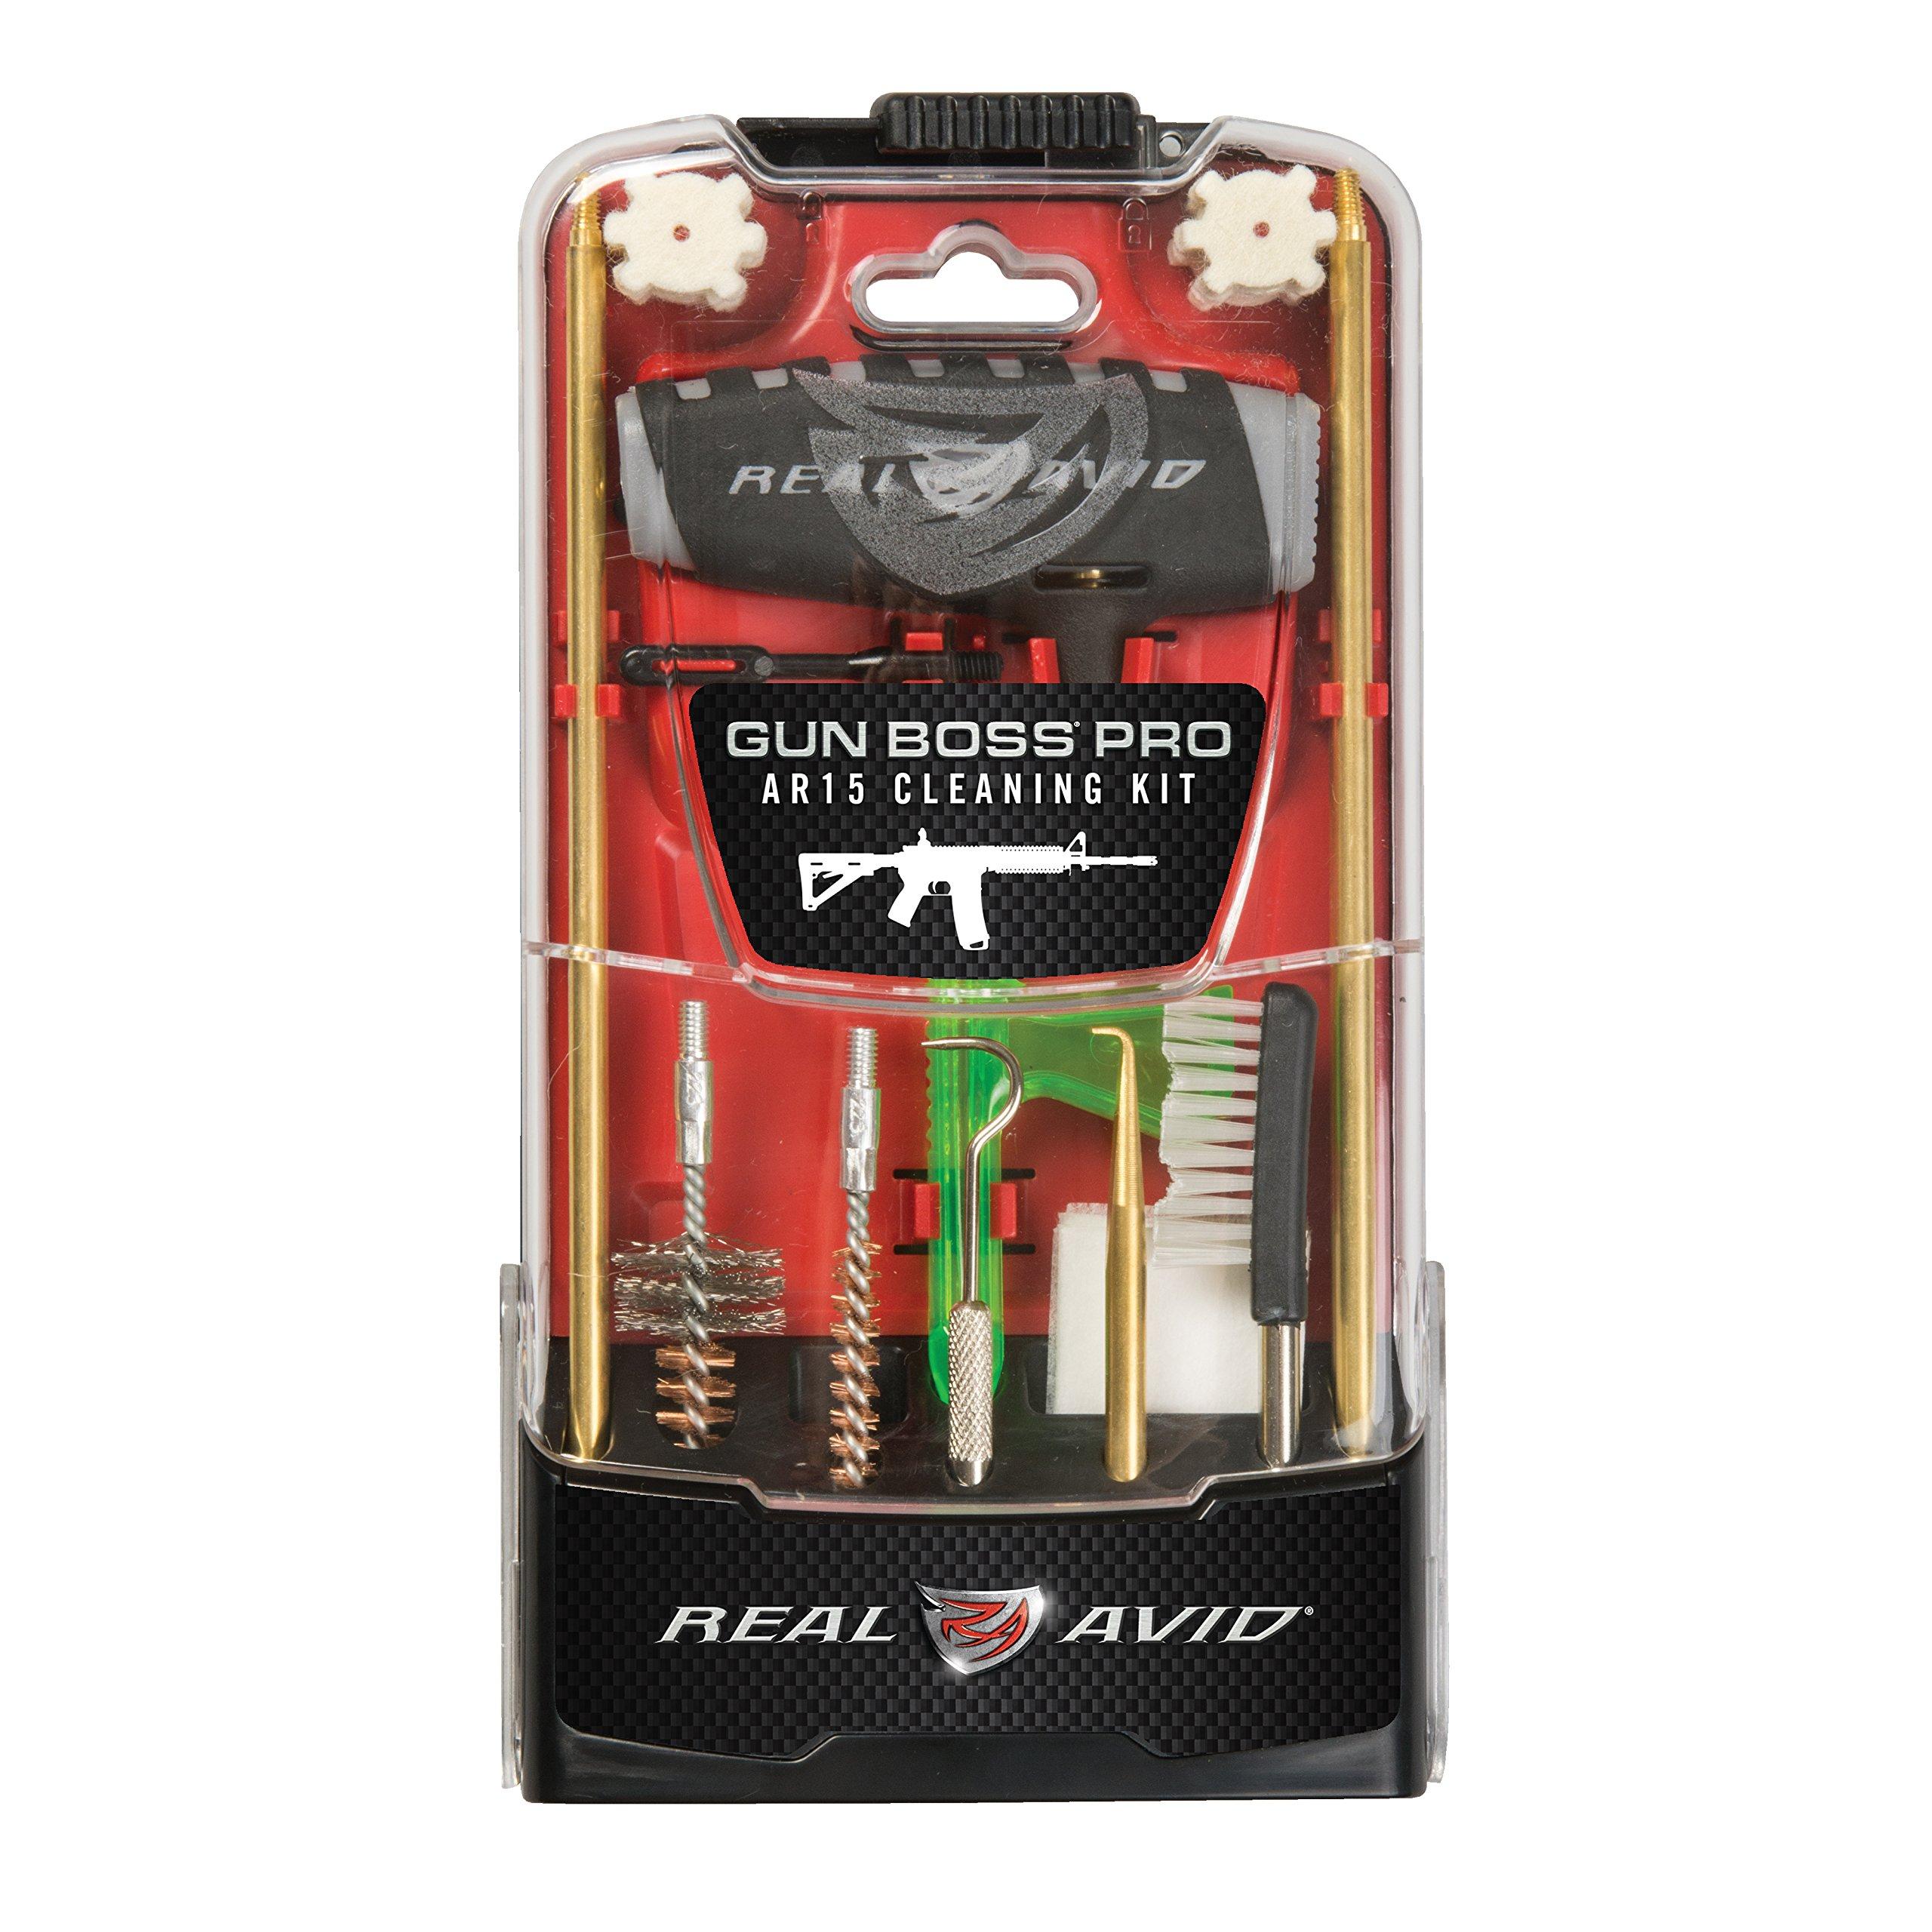 Real Avid Gun Boss Pro .223 Cleaning Kit by Real Avid